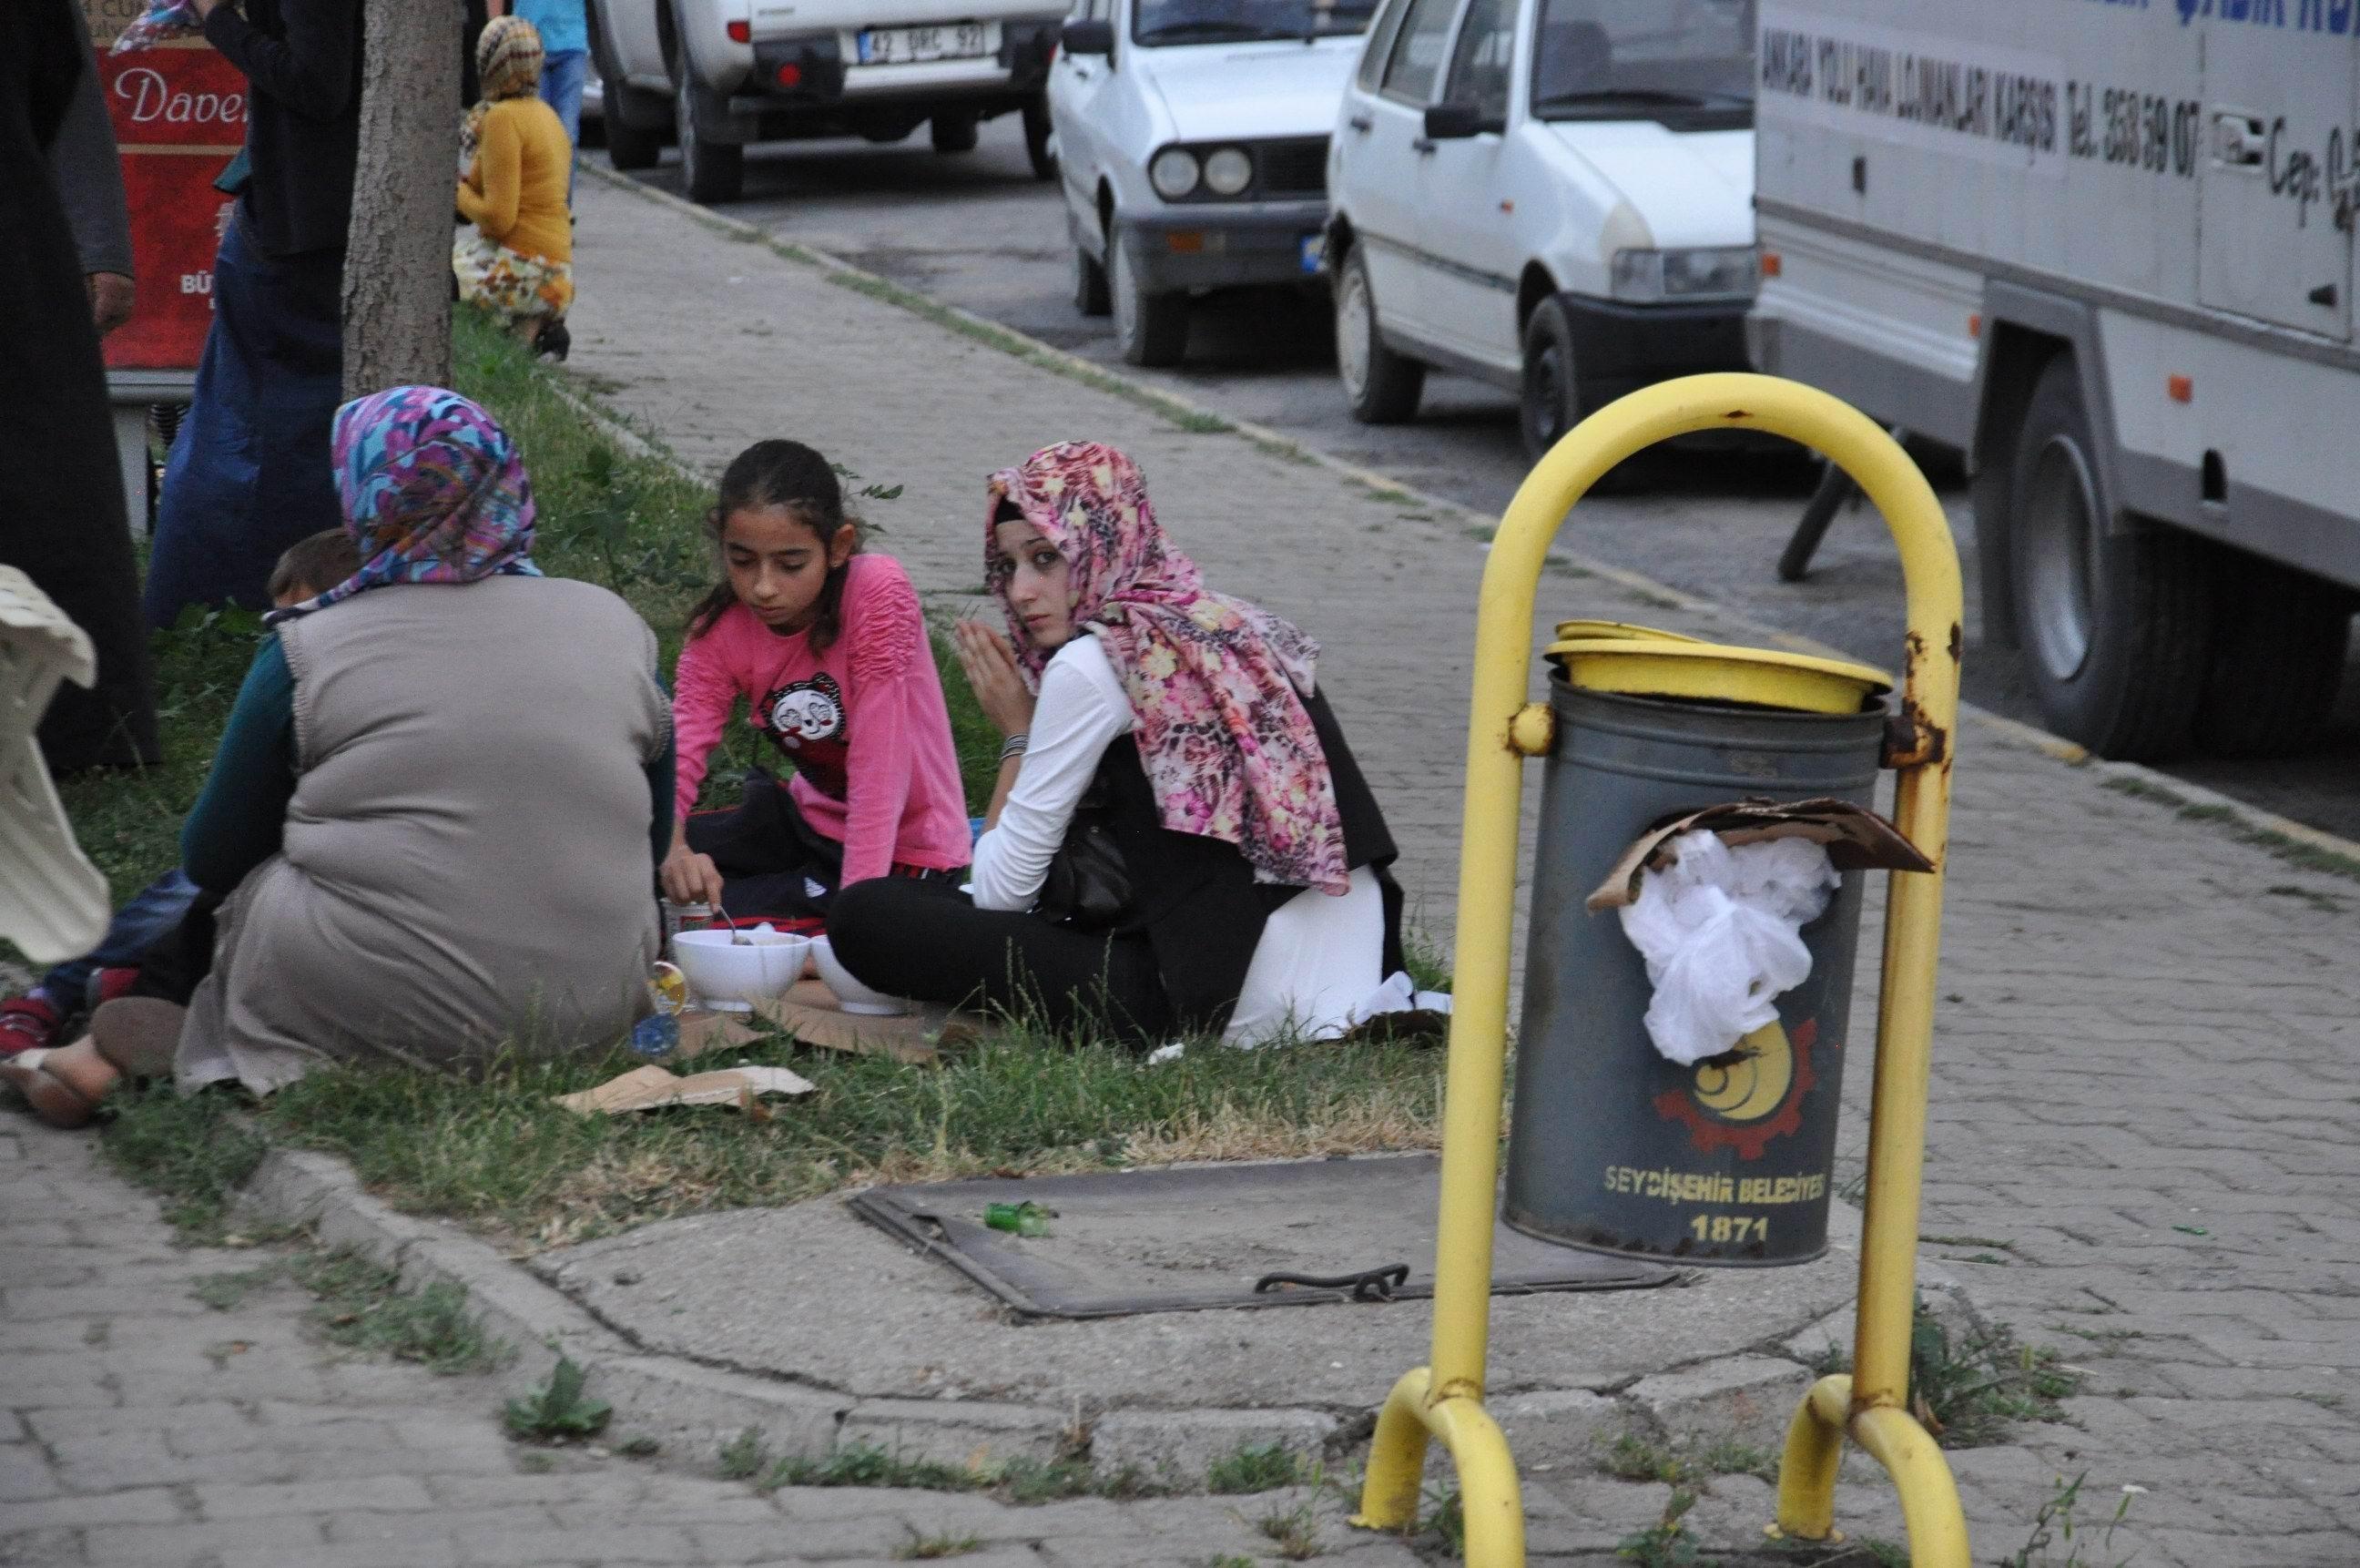 Çöp kutusu yanında iftar